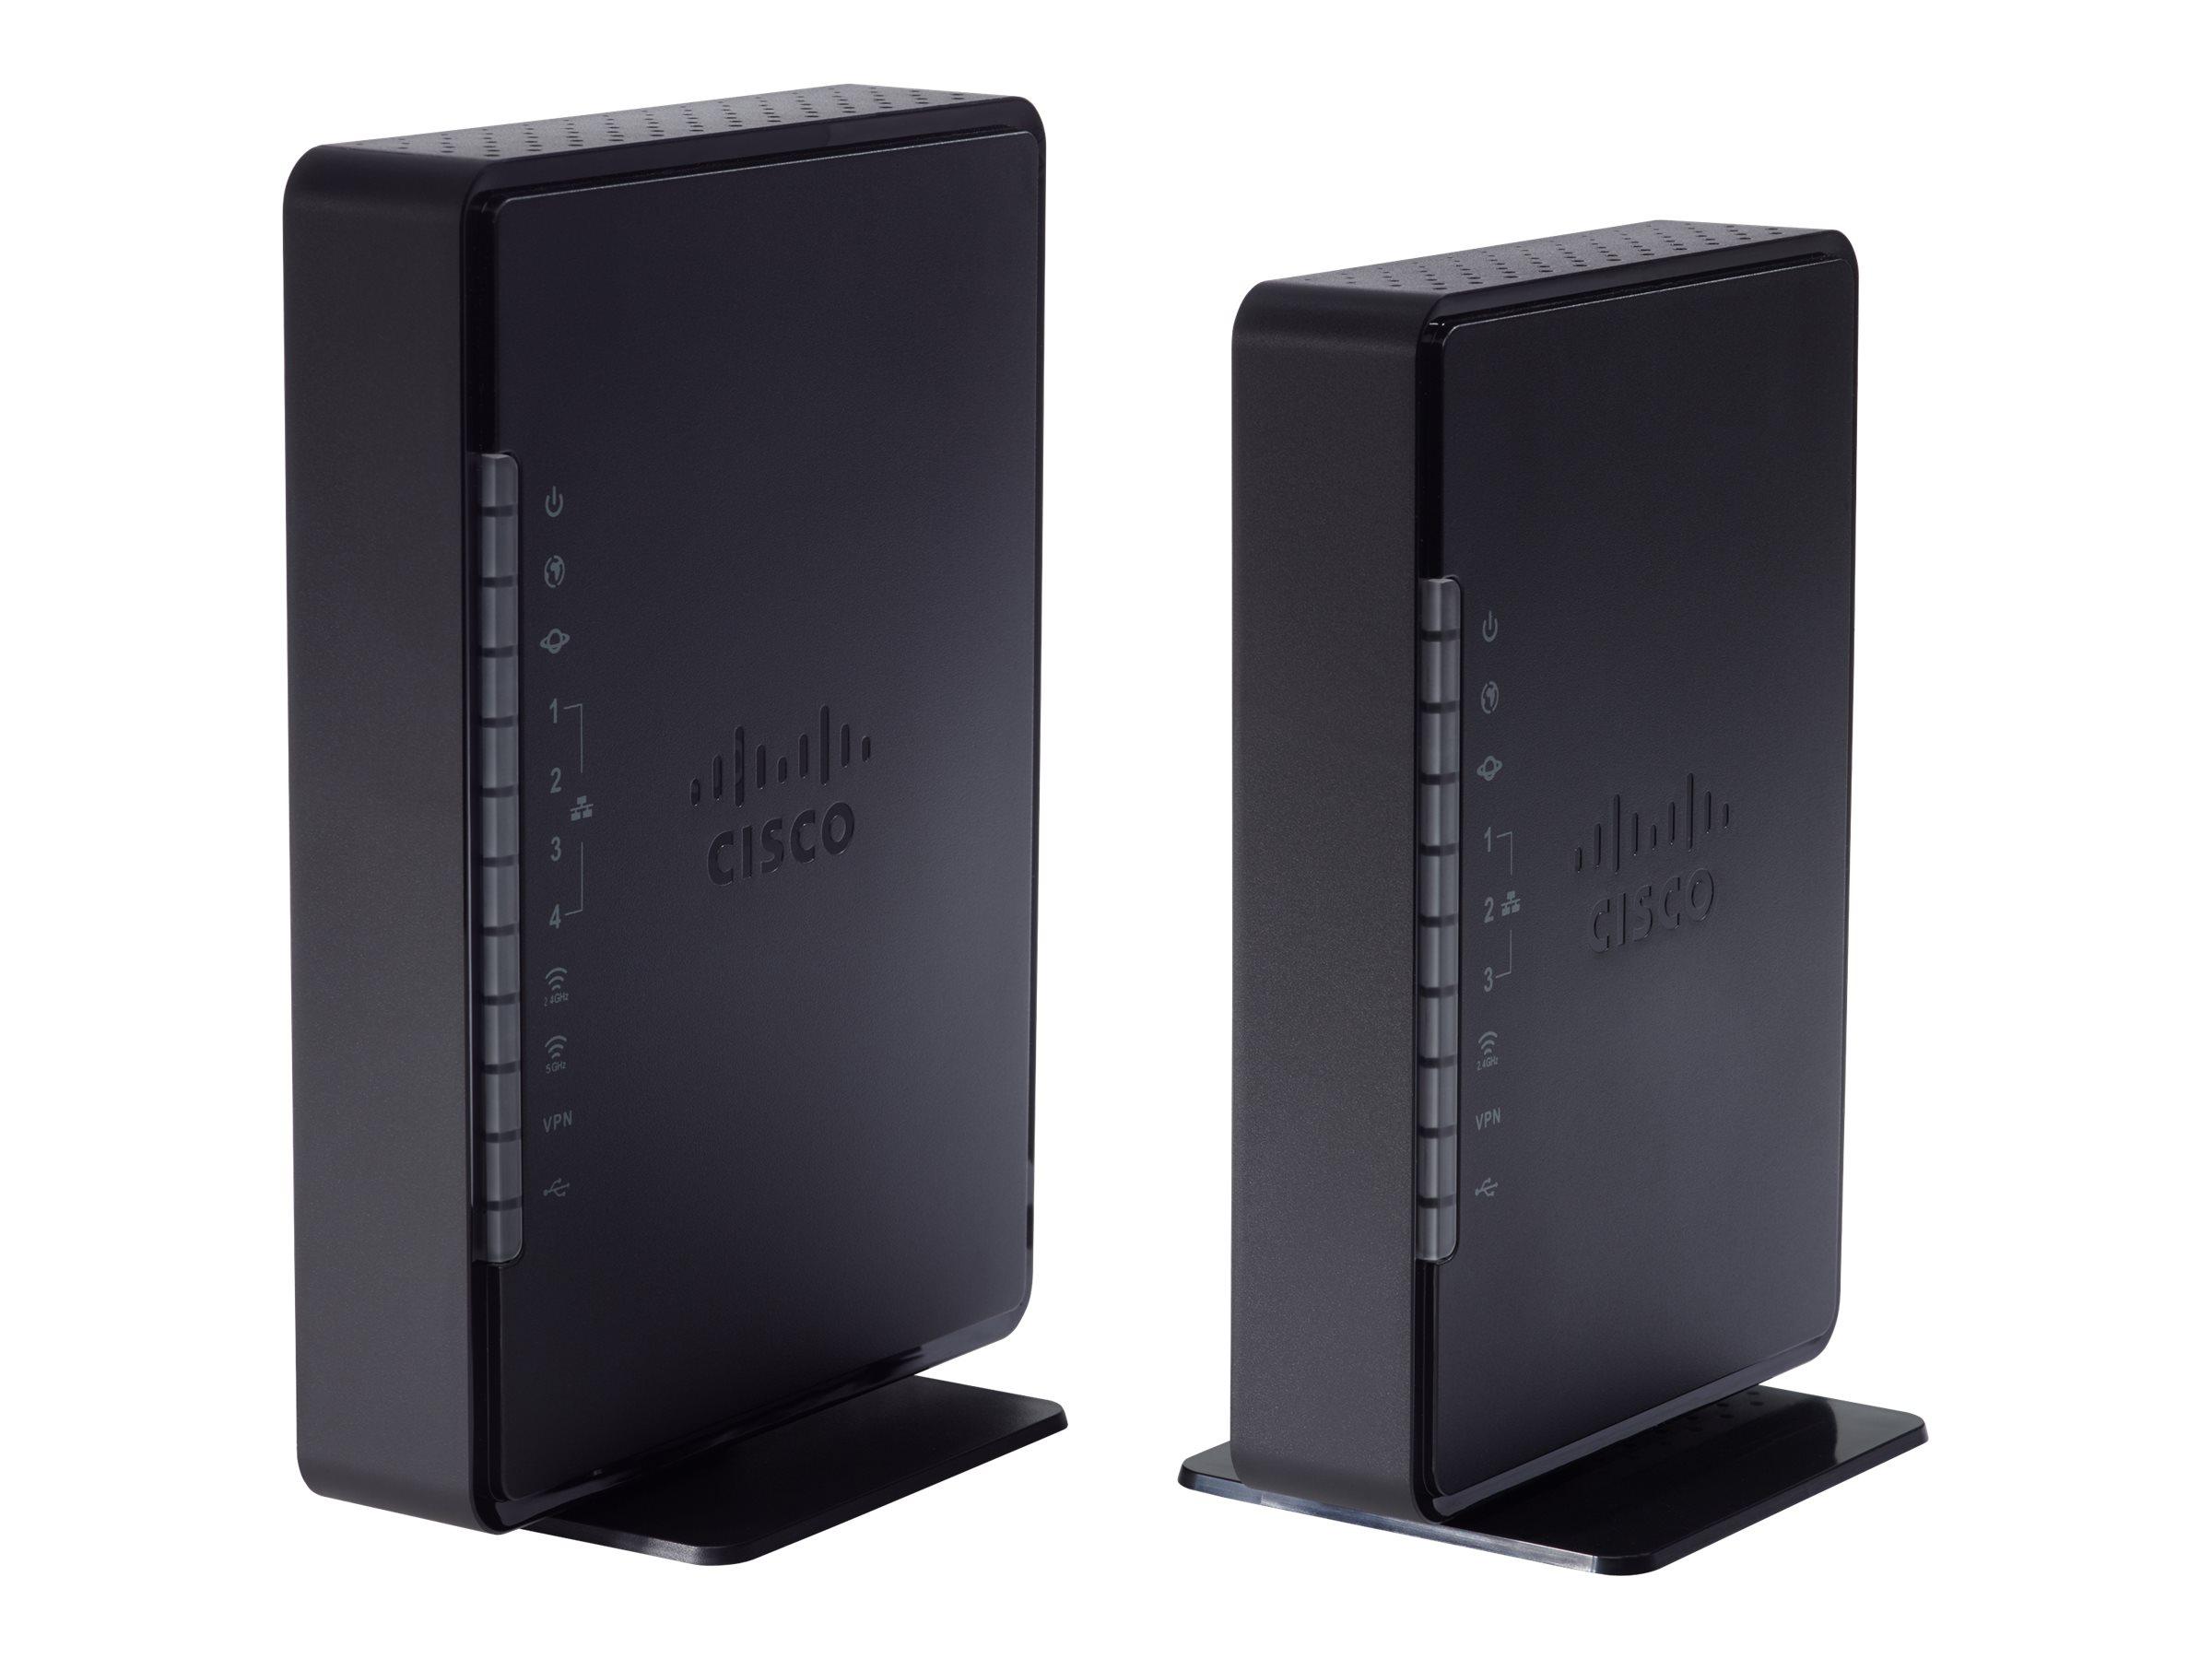 Cisco Small Business RV132W - Wireless Router